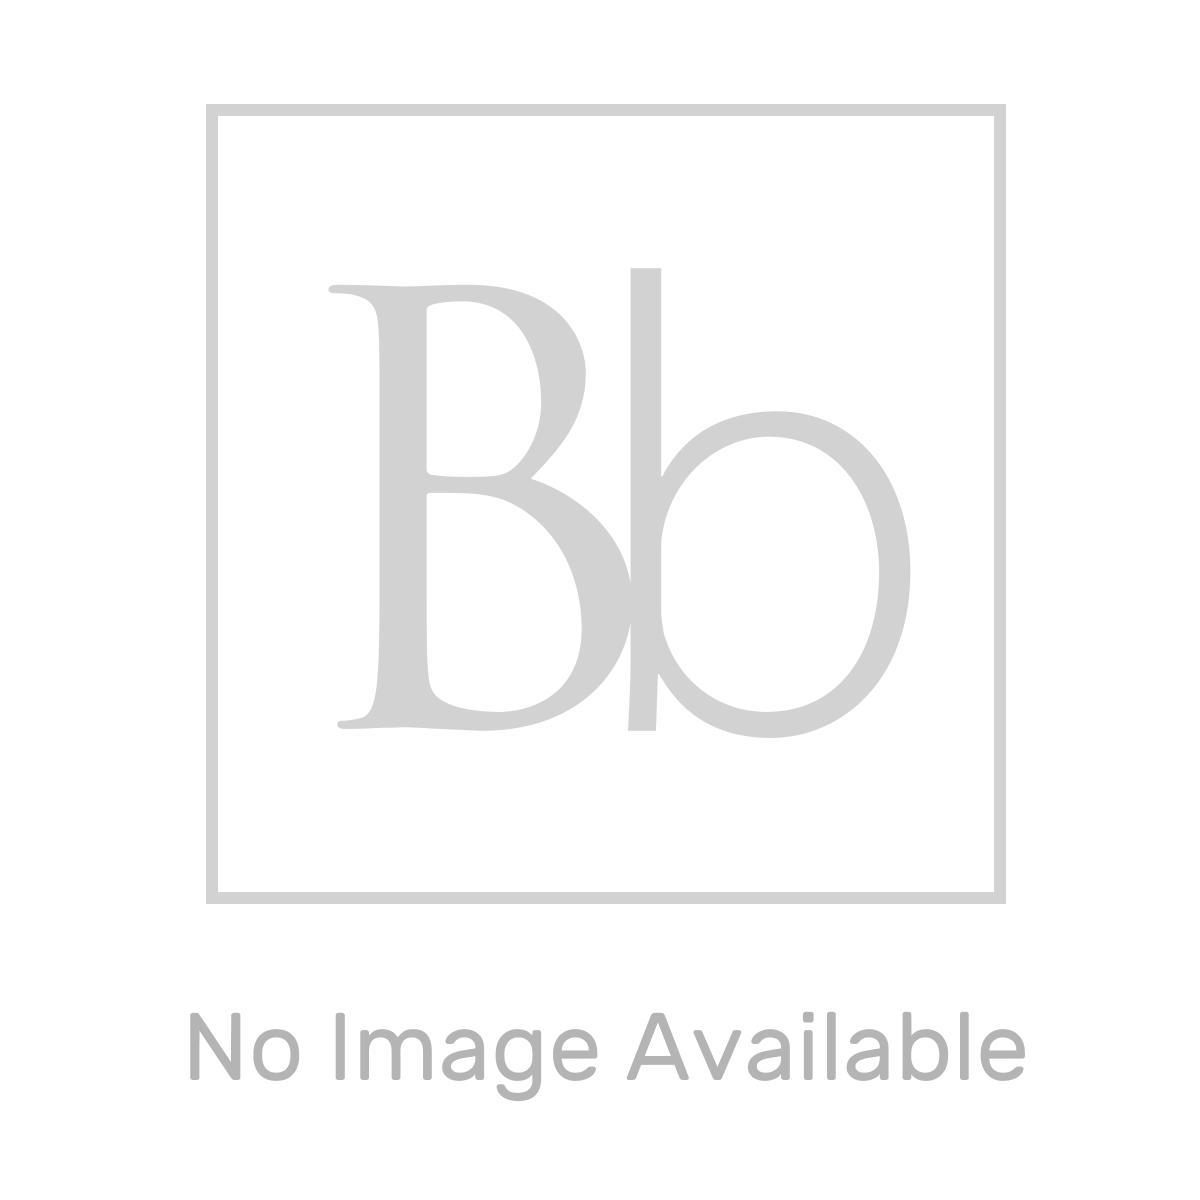 Aquadart White Slate Shower Tray 1700 x 800 Overhead